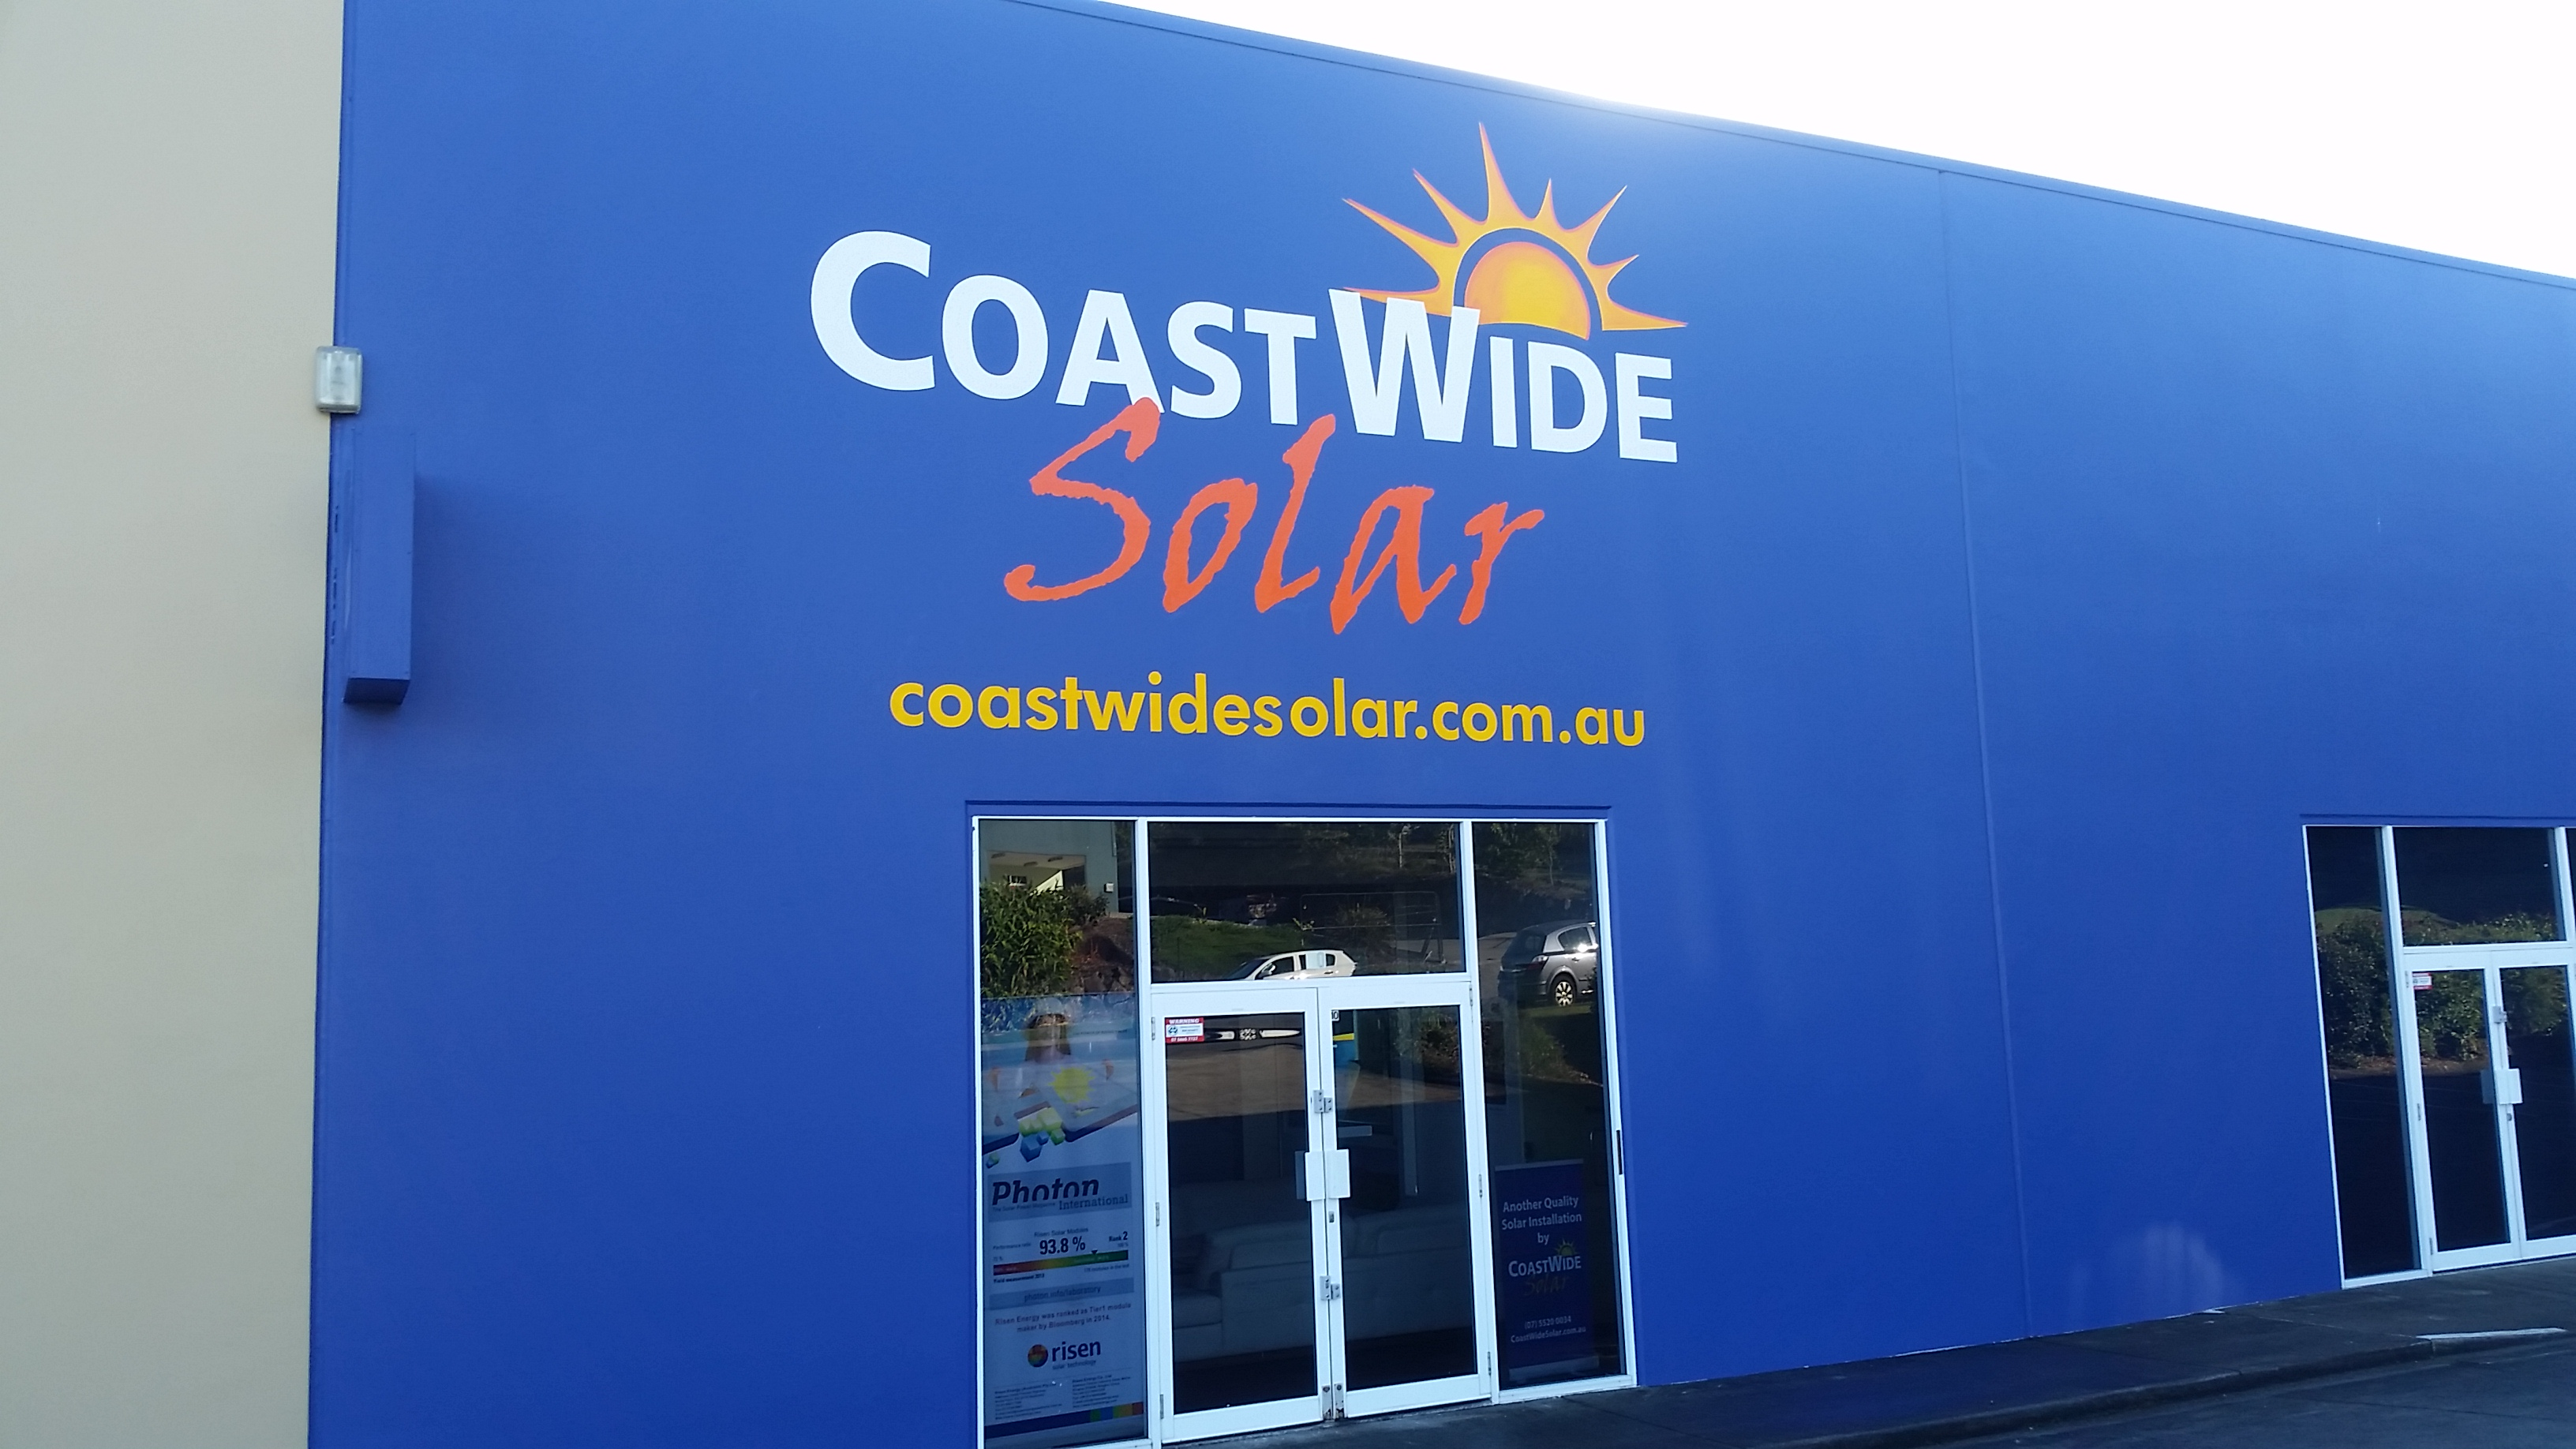 Coastwide Solar Building Front